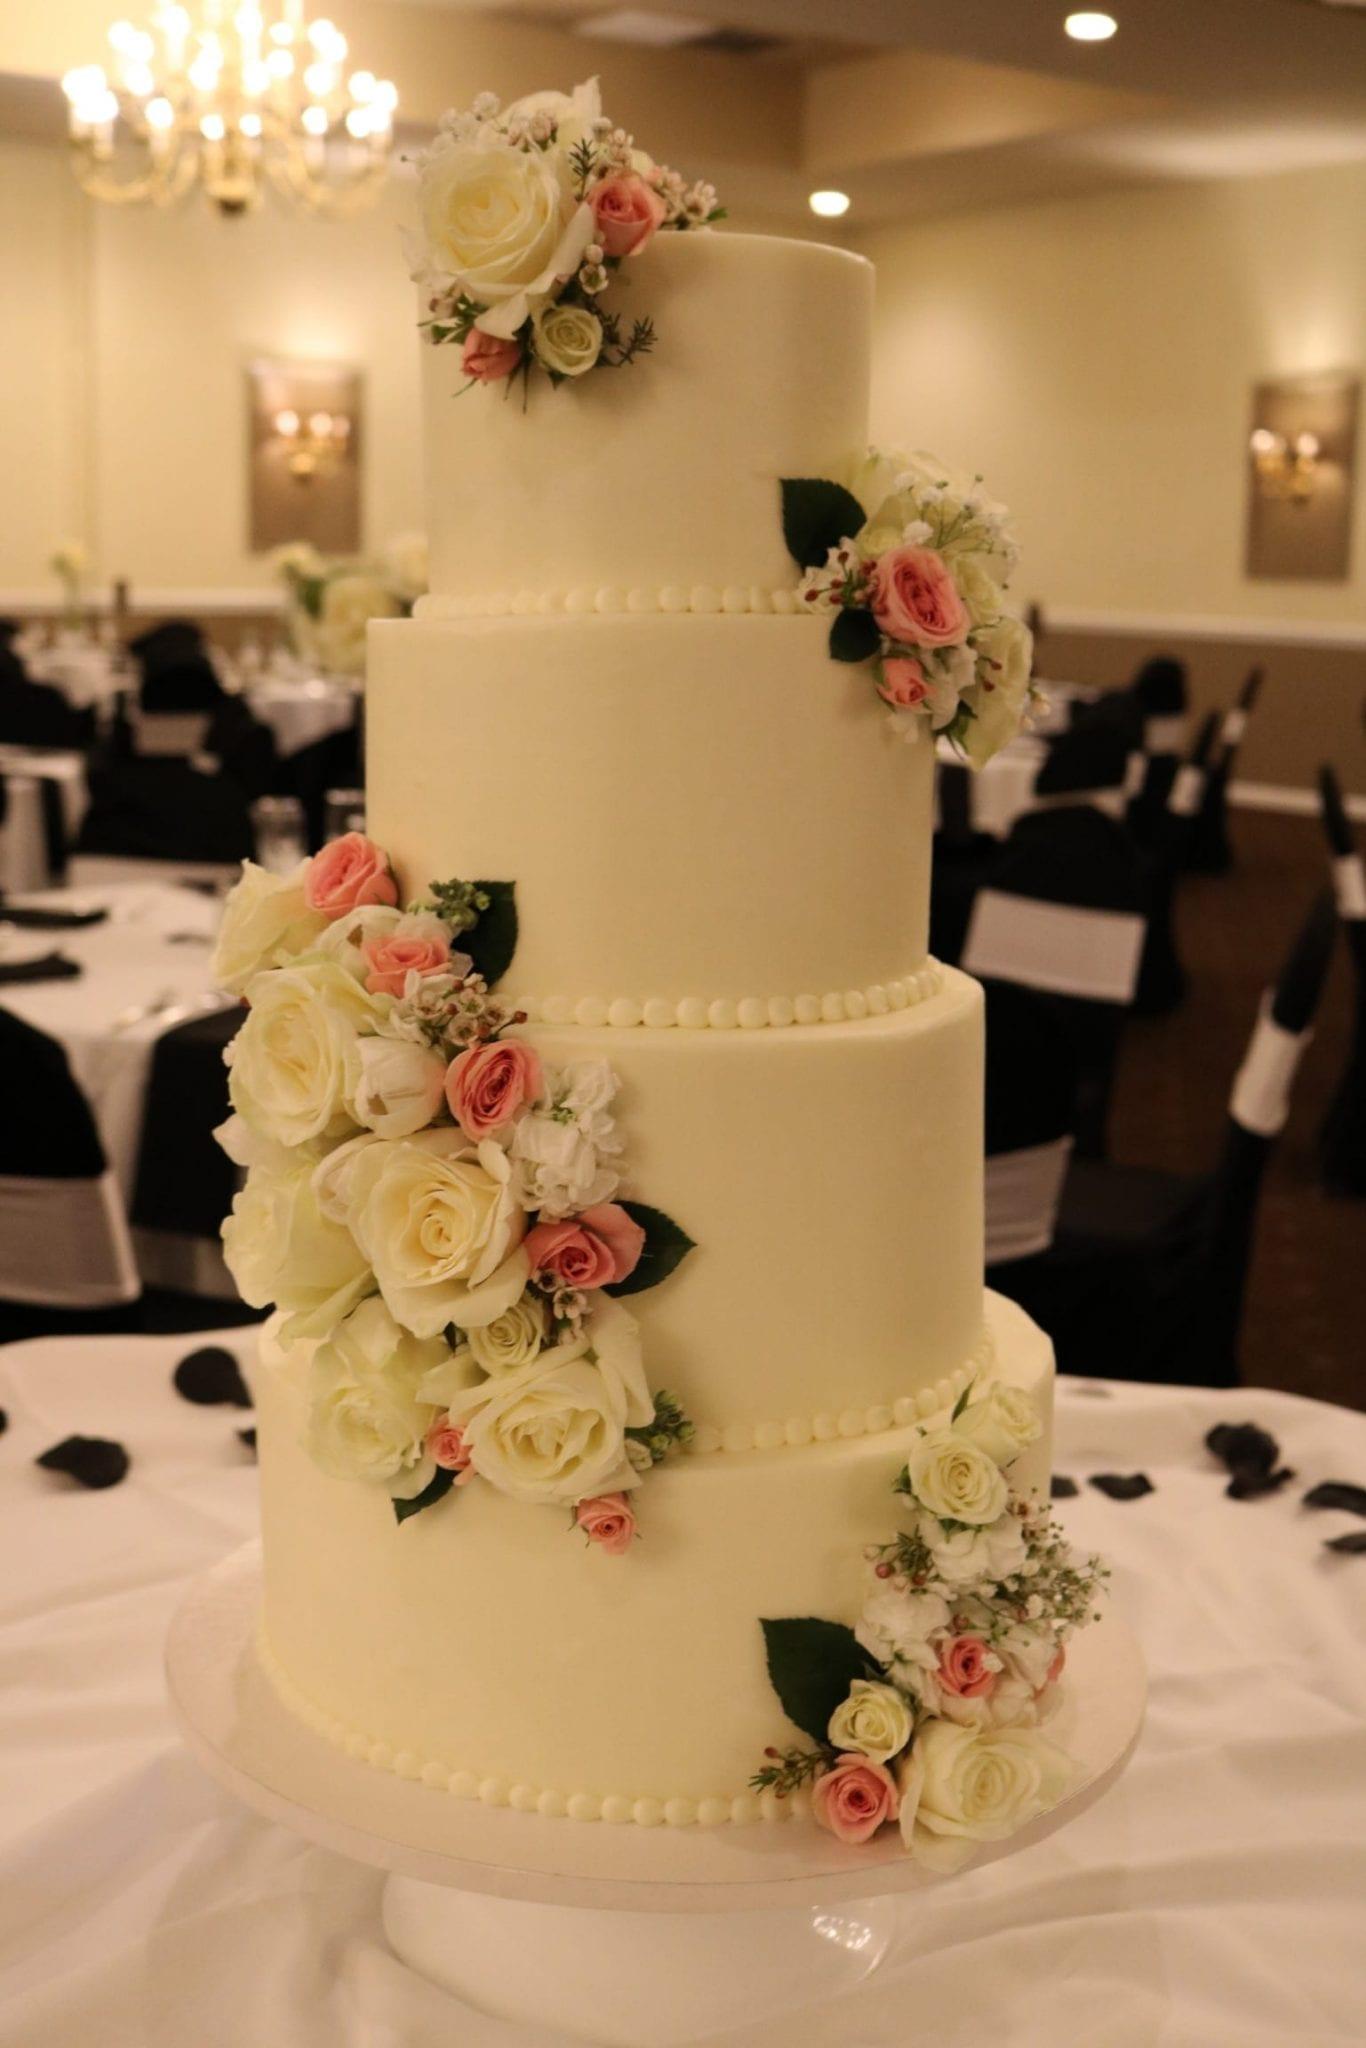 4 Tier Wedding Cake with Fresh Flowers | 3 Sweet Girls Cakery